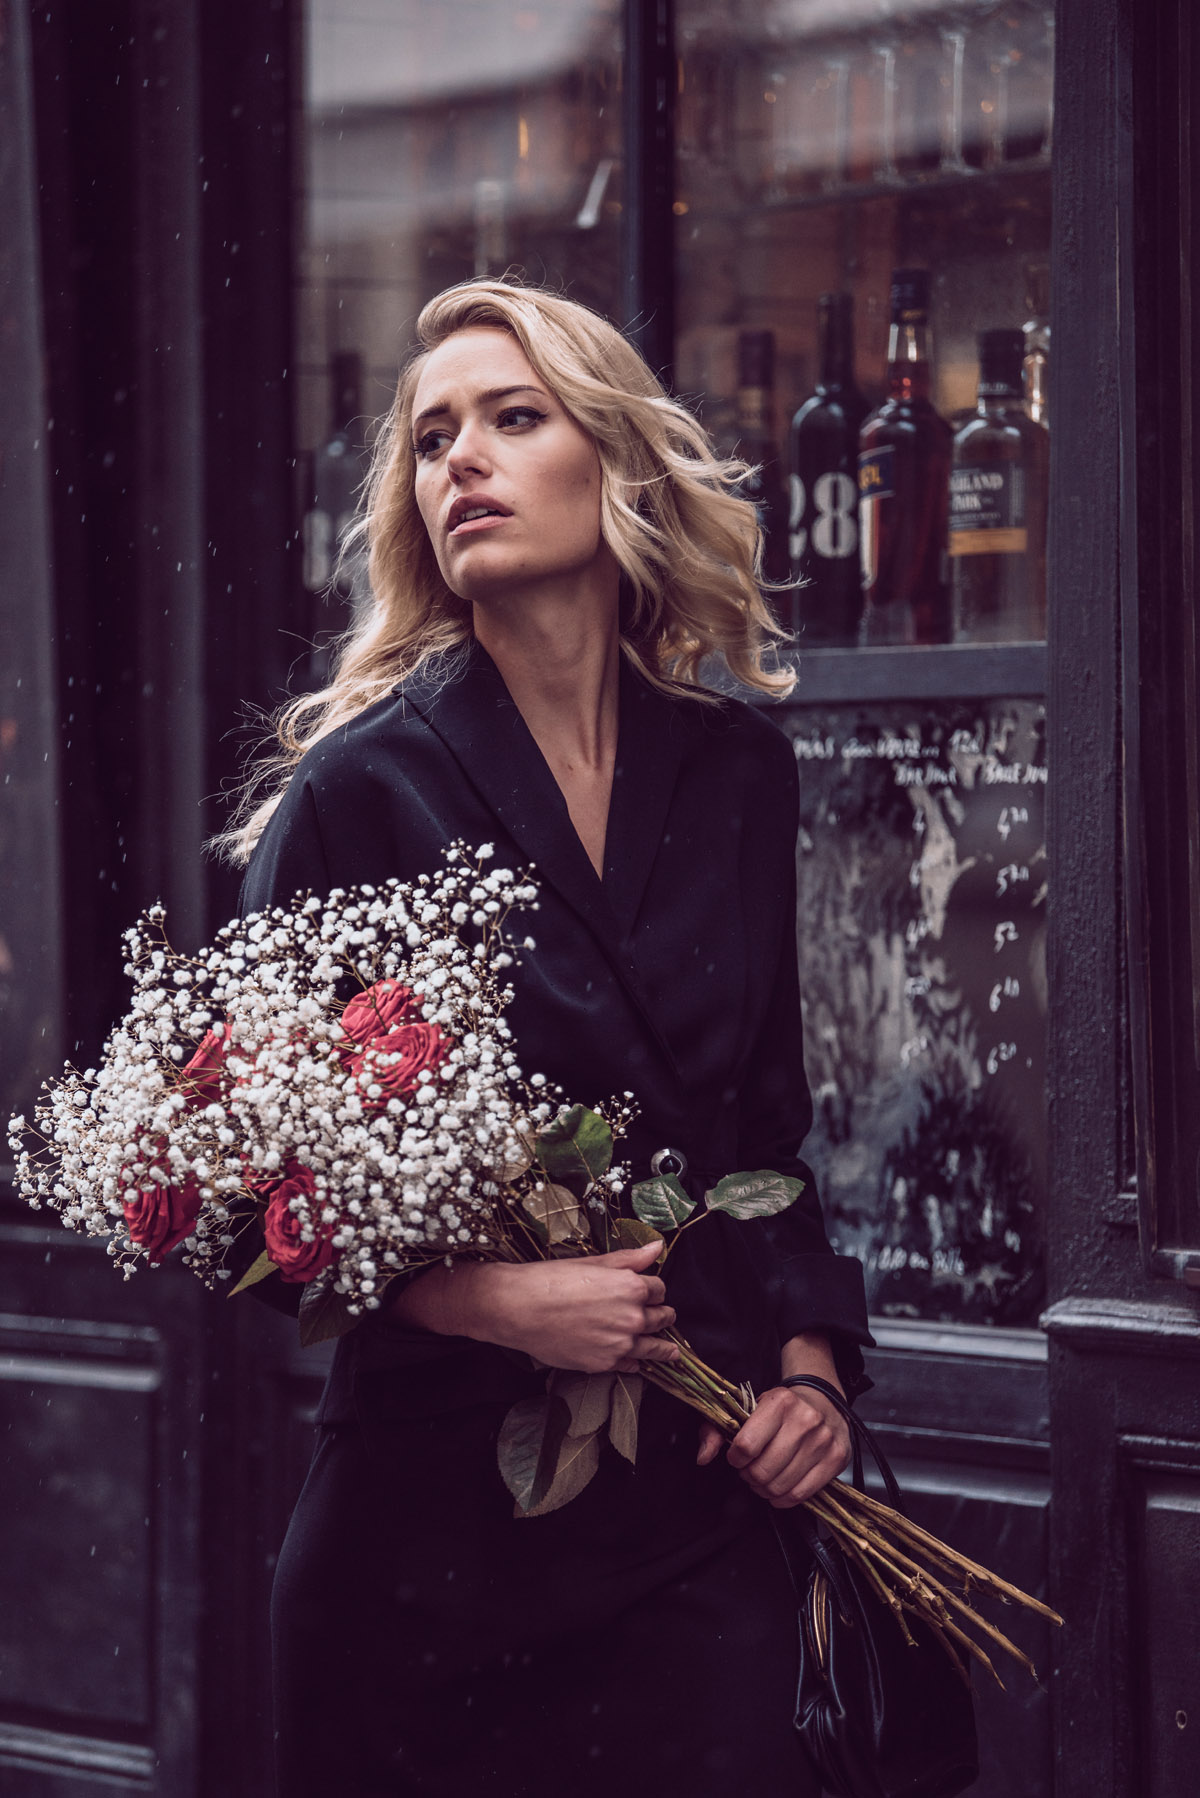 Paris Female couple Editorial - nouvelle Romance homage by Peter Mueller Photography 31